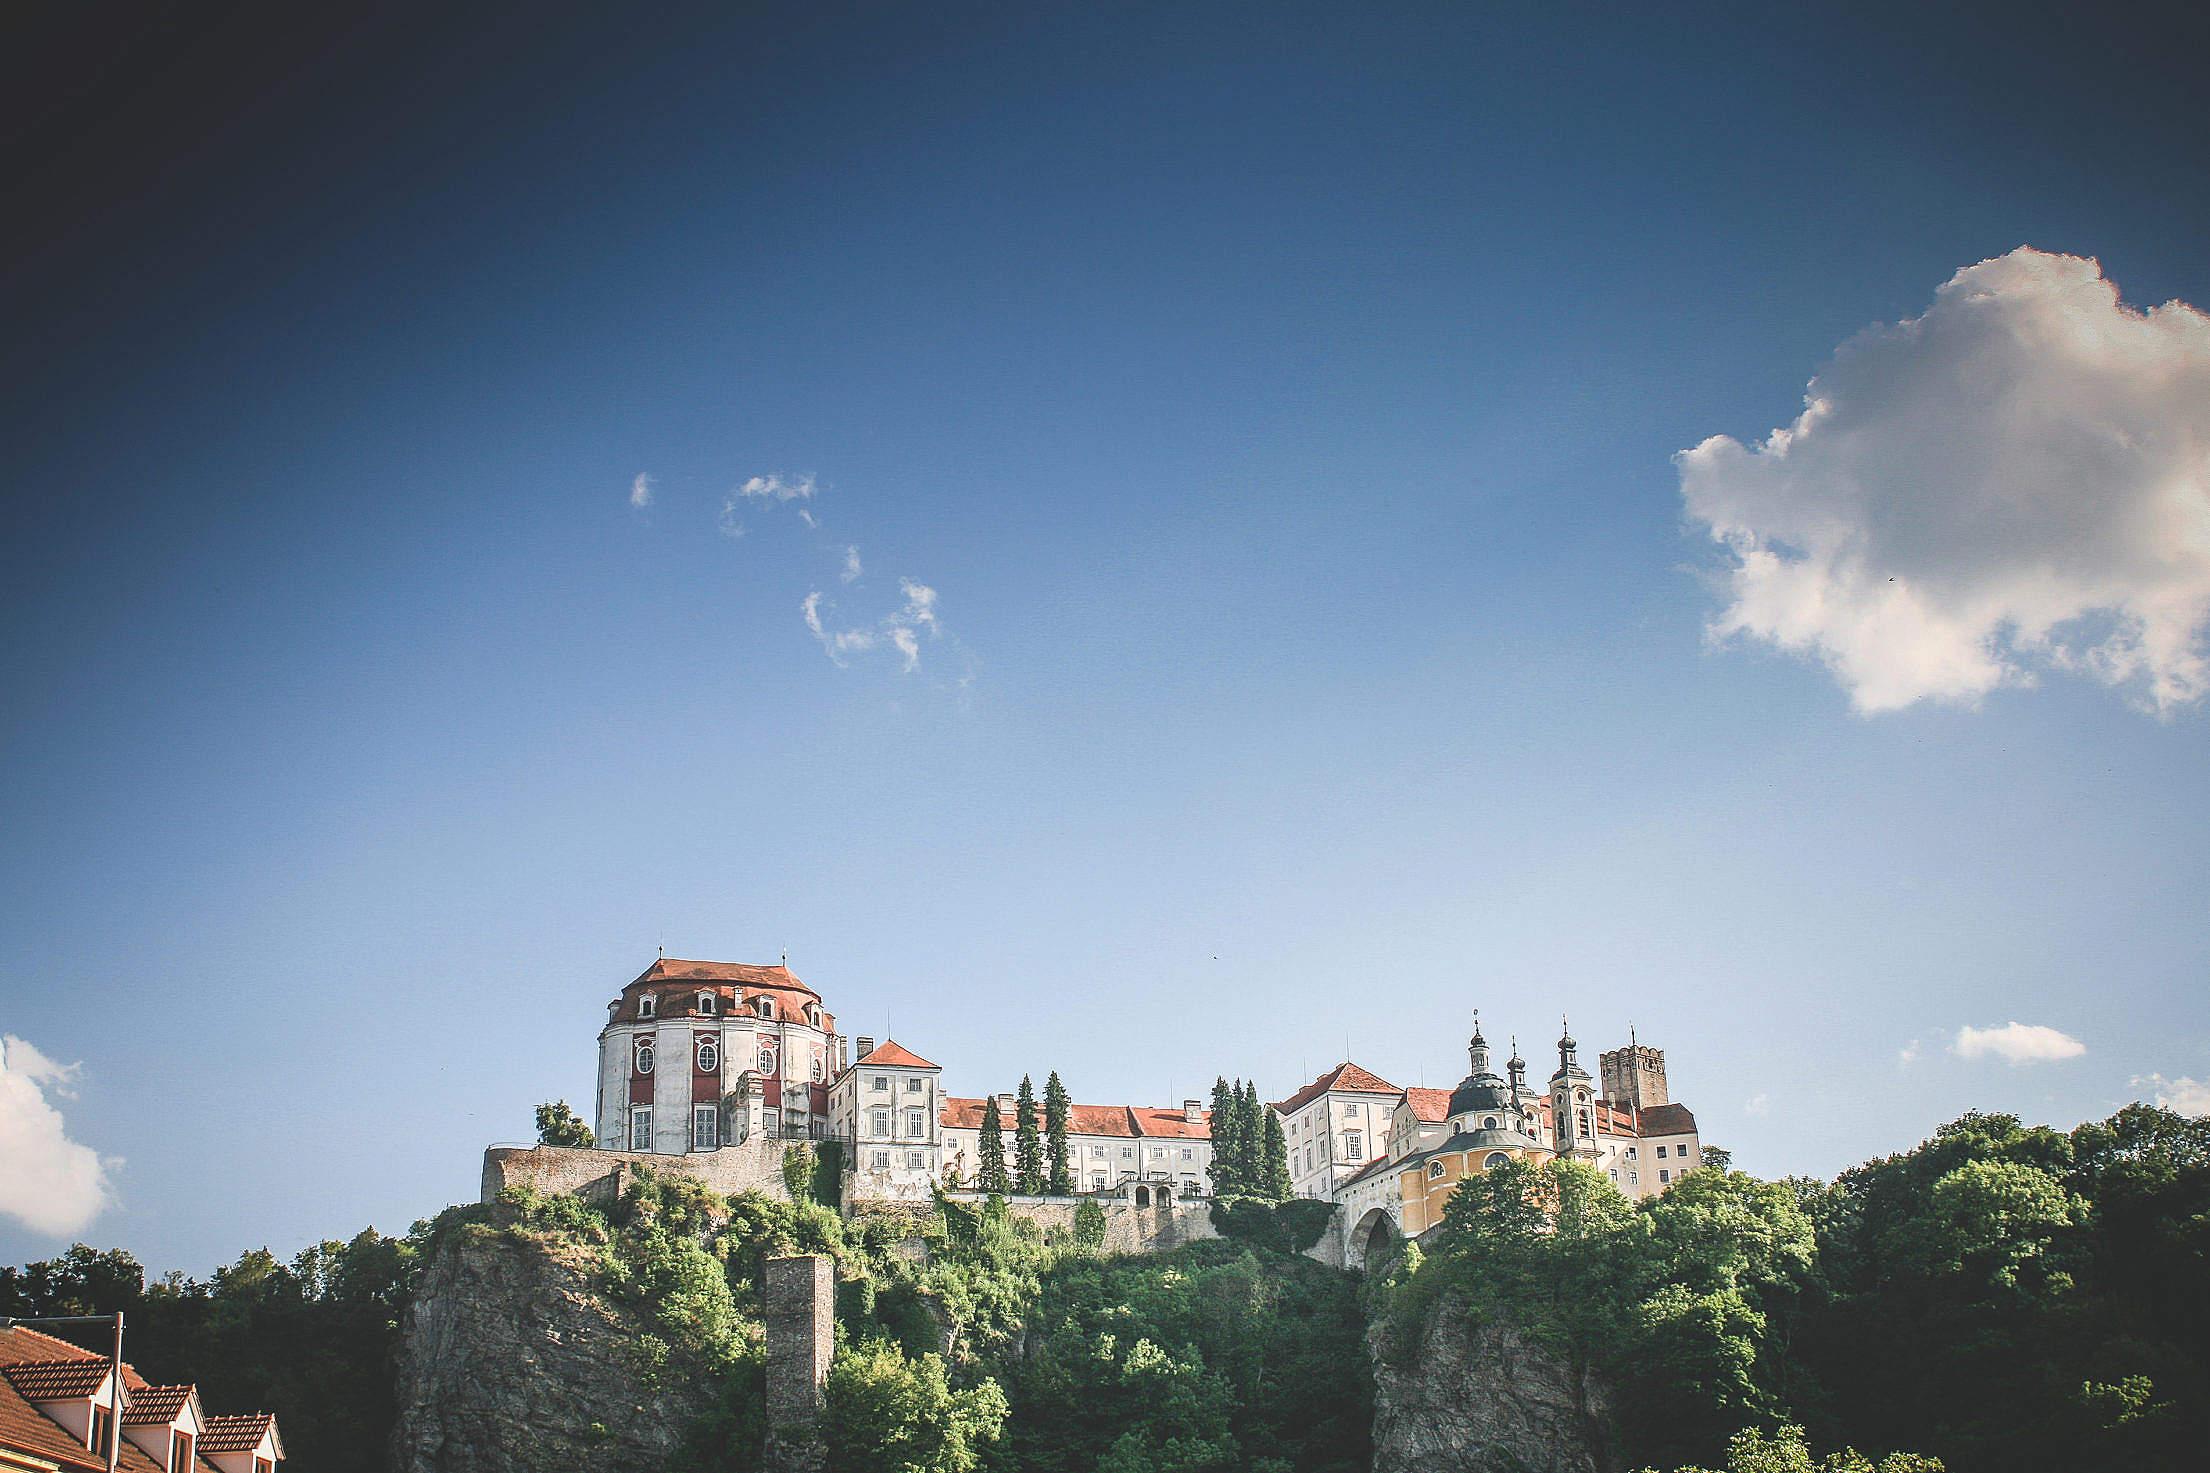 Vranov Castle #2: With Big Sky Free Stock Photo